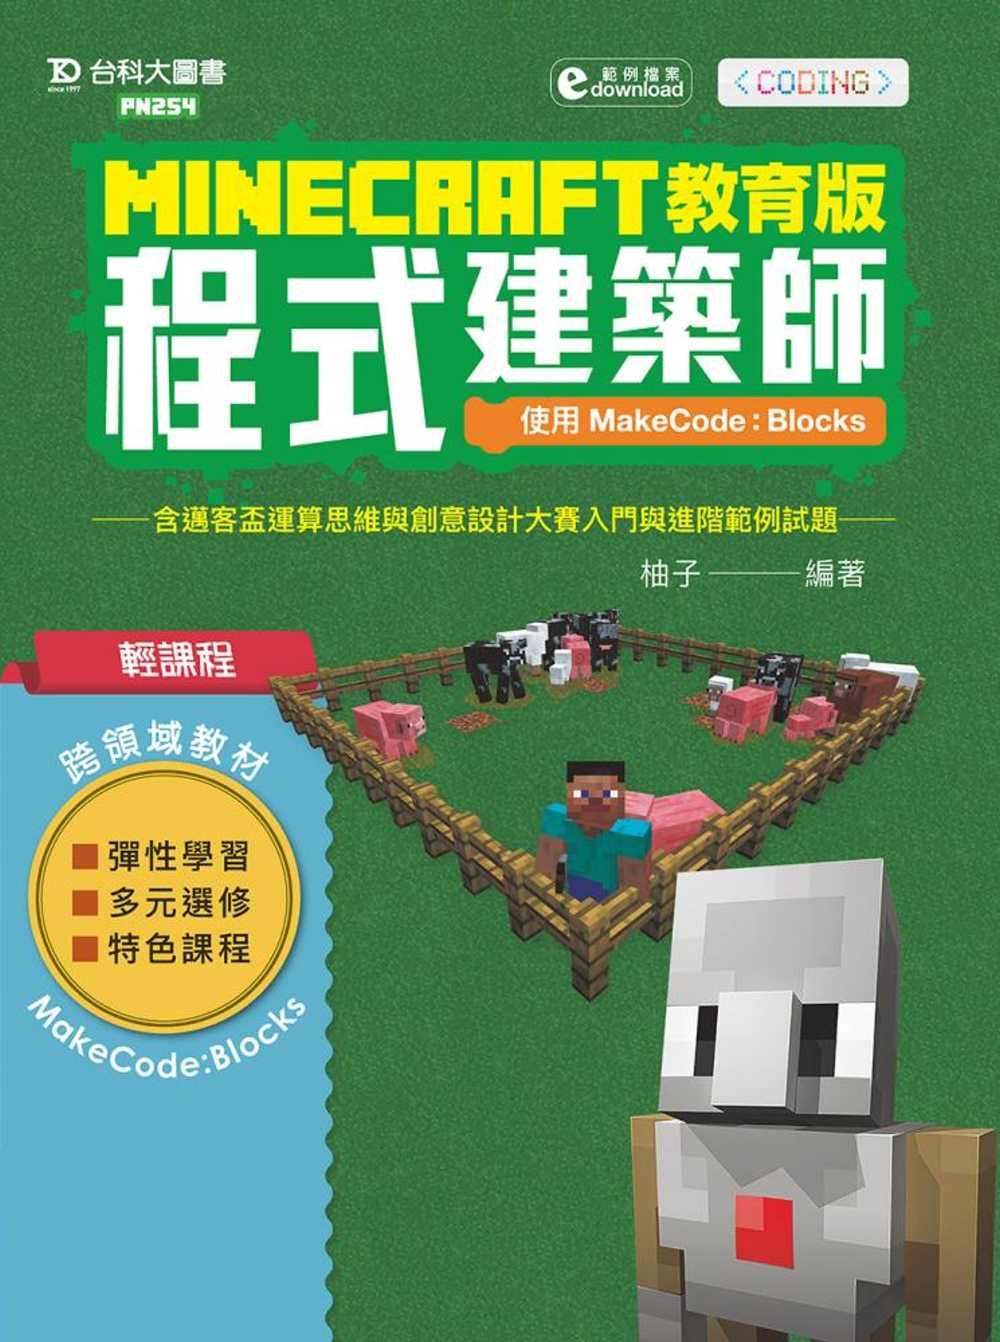 Minecraft教育版程式建築師 - 使用MakeCode:Blocks含邁客盃運算思維與創意設計大賽入門與進階範例試題附範例檔案